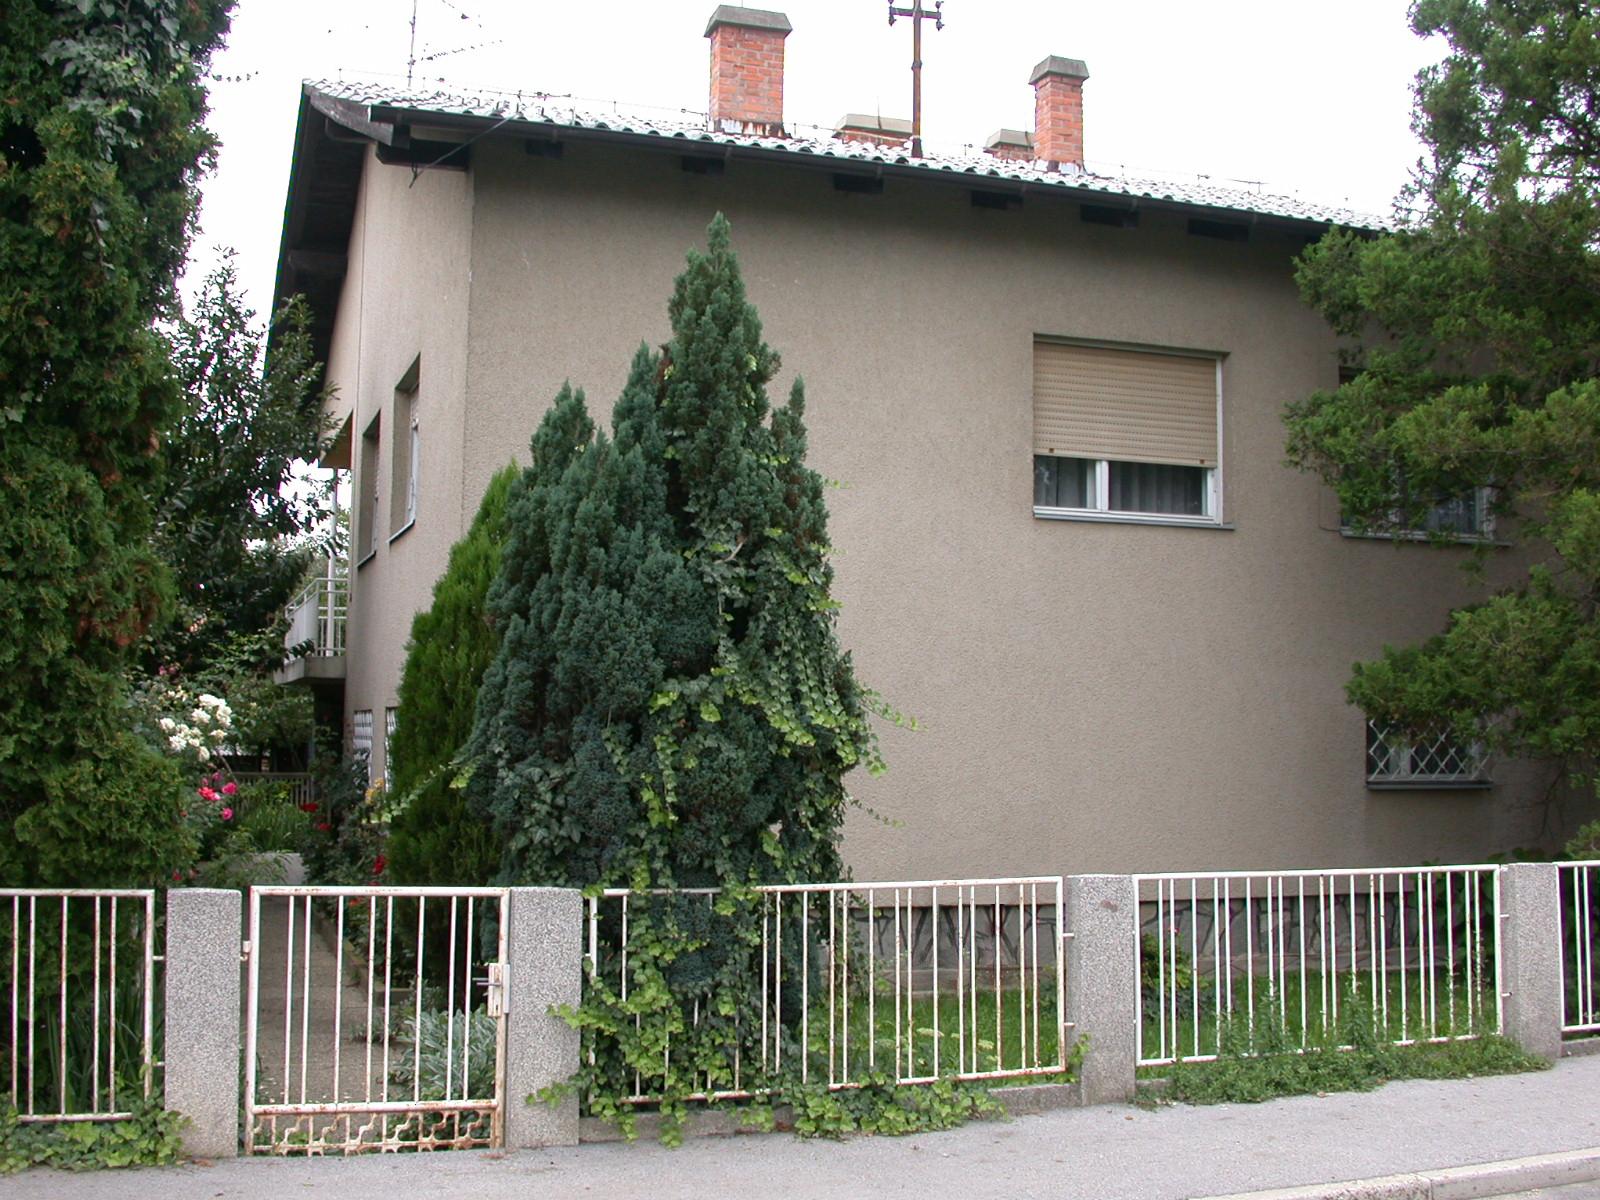 House for sale - MURSKA SOBOTA - Prekmurje - SLOVENIA